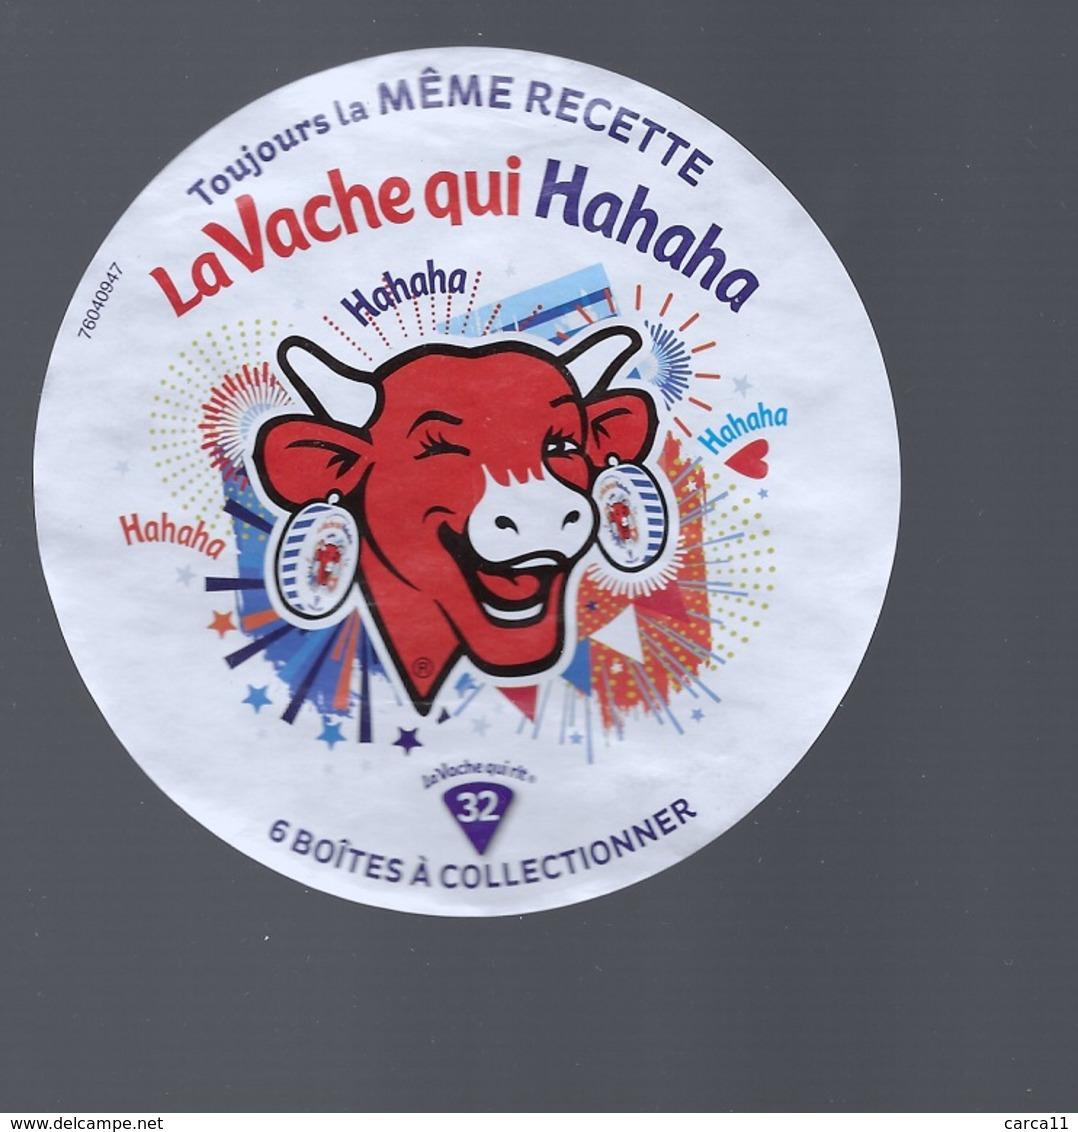 LA VACHE QUI RIT - Etiquette N° 76040947 - La Vache Qui Hahaha - - Quesos